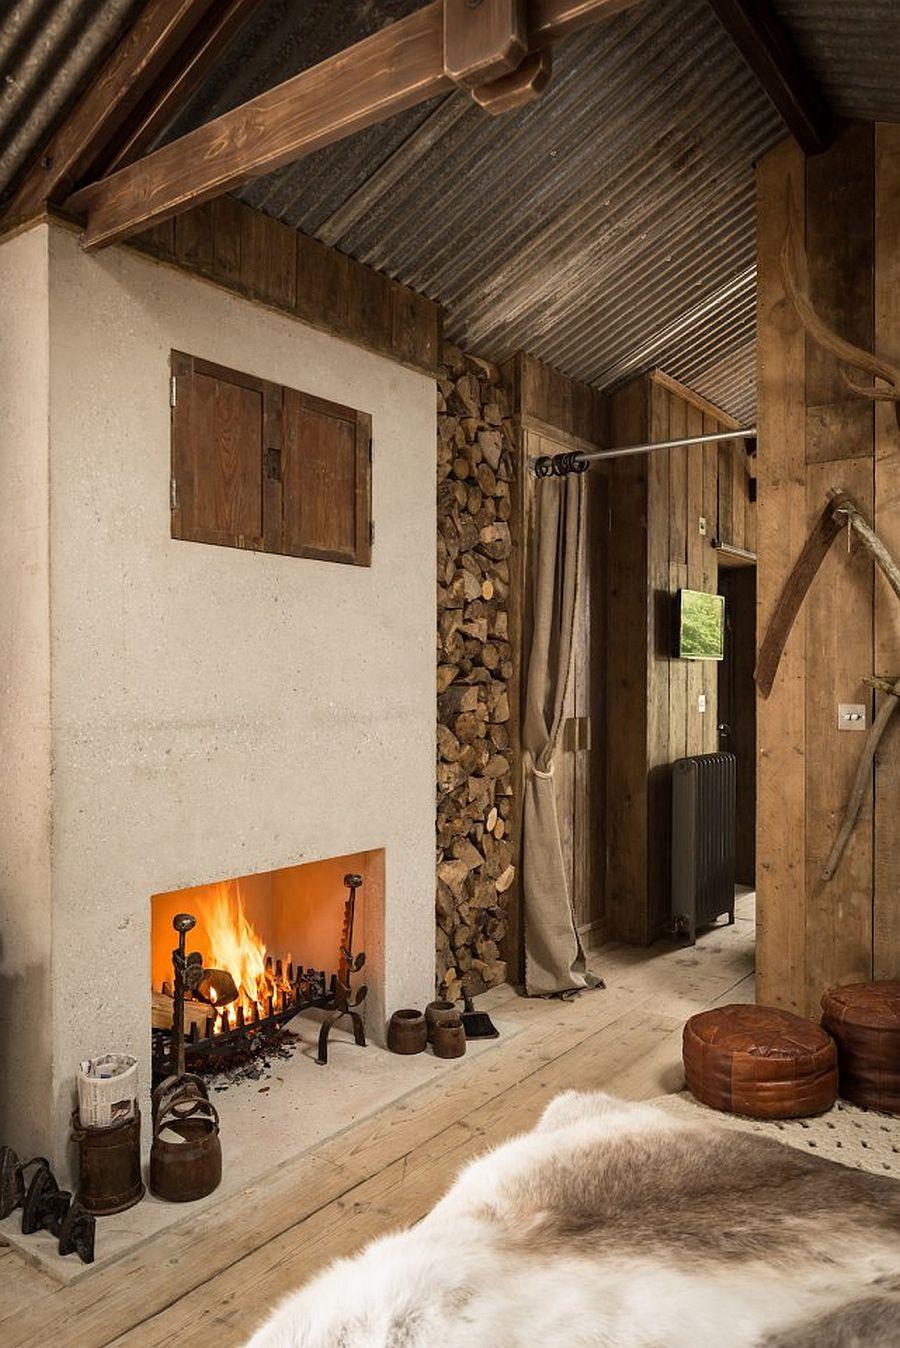 adelaparvu.com despre cabana rustica si tuse industriale, Firefly Cabin, Cornwall, Anglia, Foto Unique Home Stays (22)